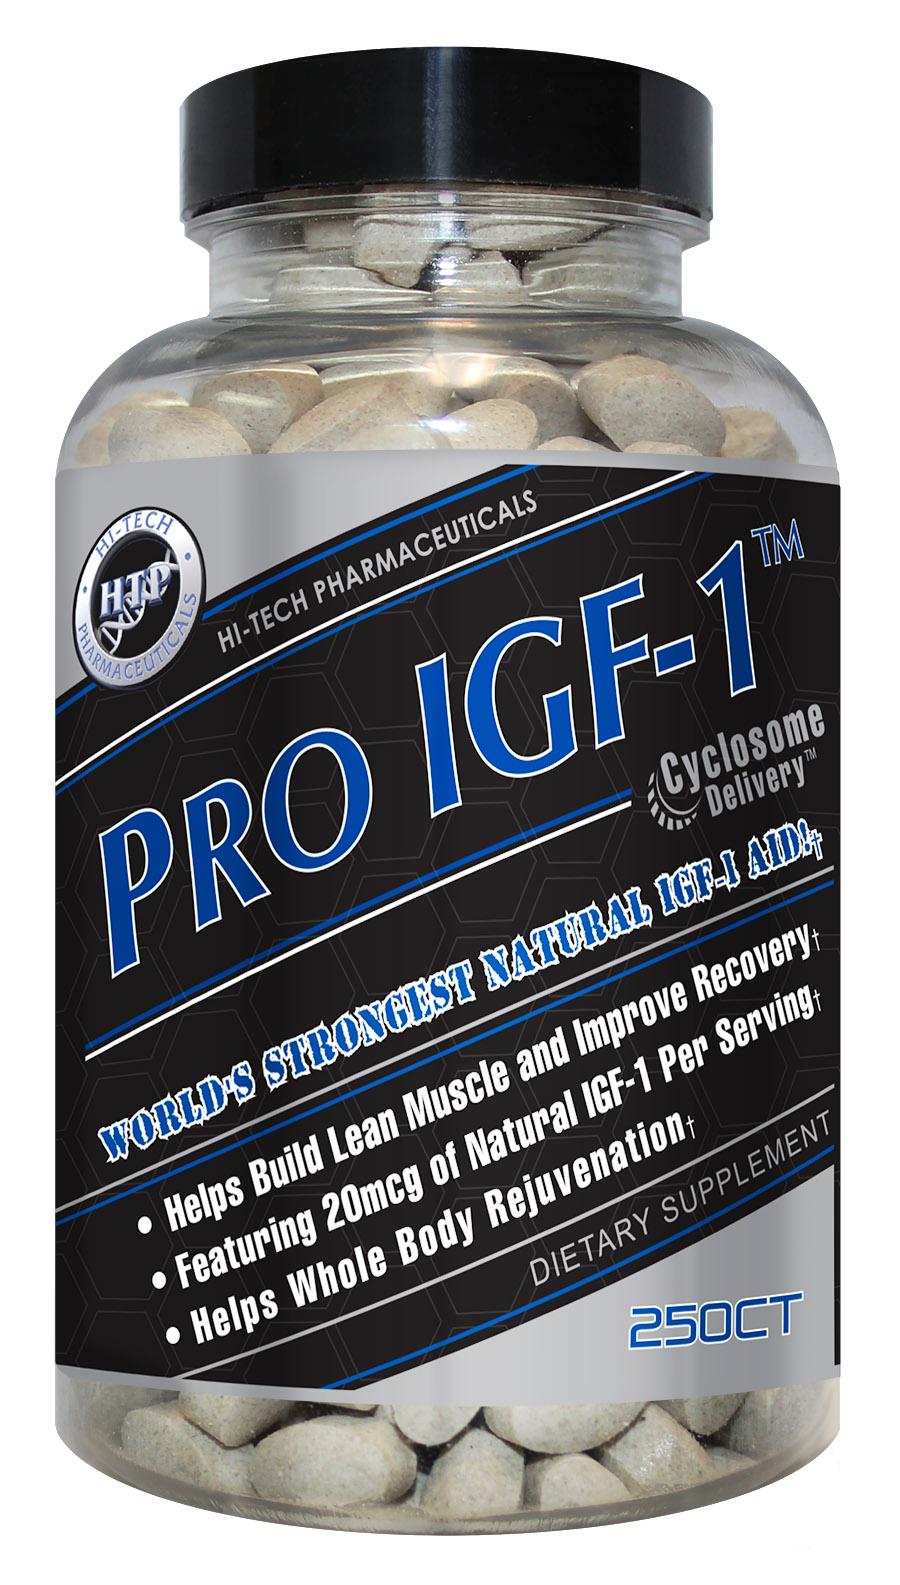 Hi-Tech Pro IGF-1: The First Orally Bioavailable IGF-1